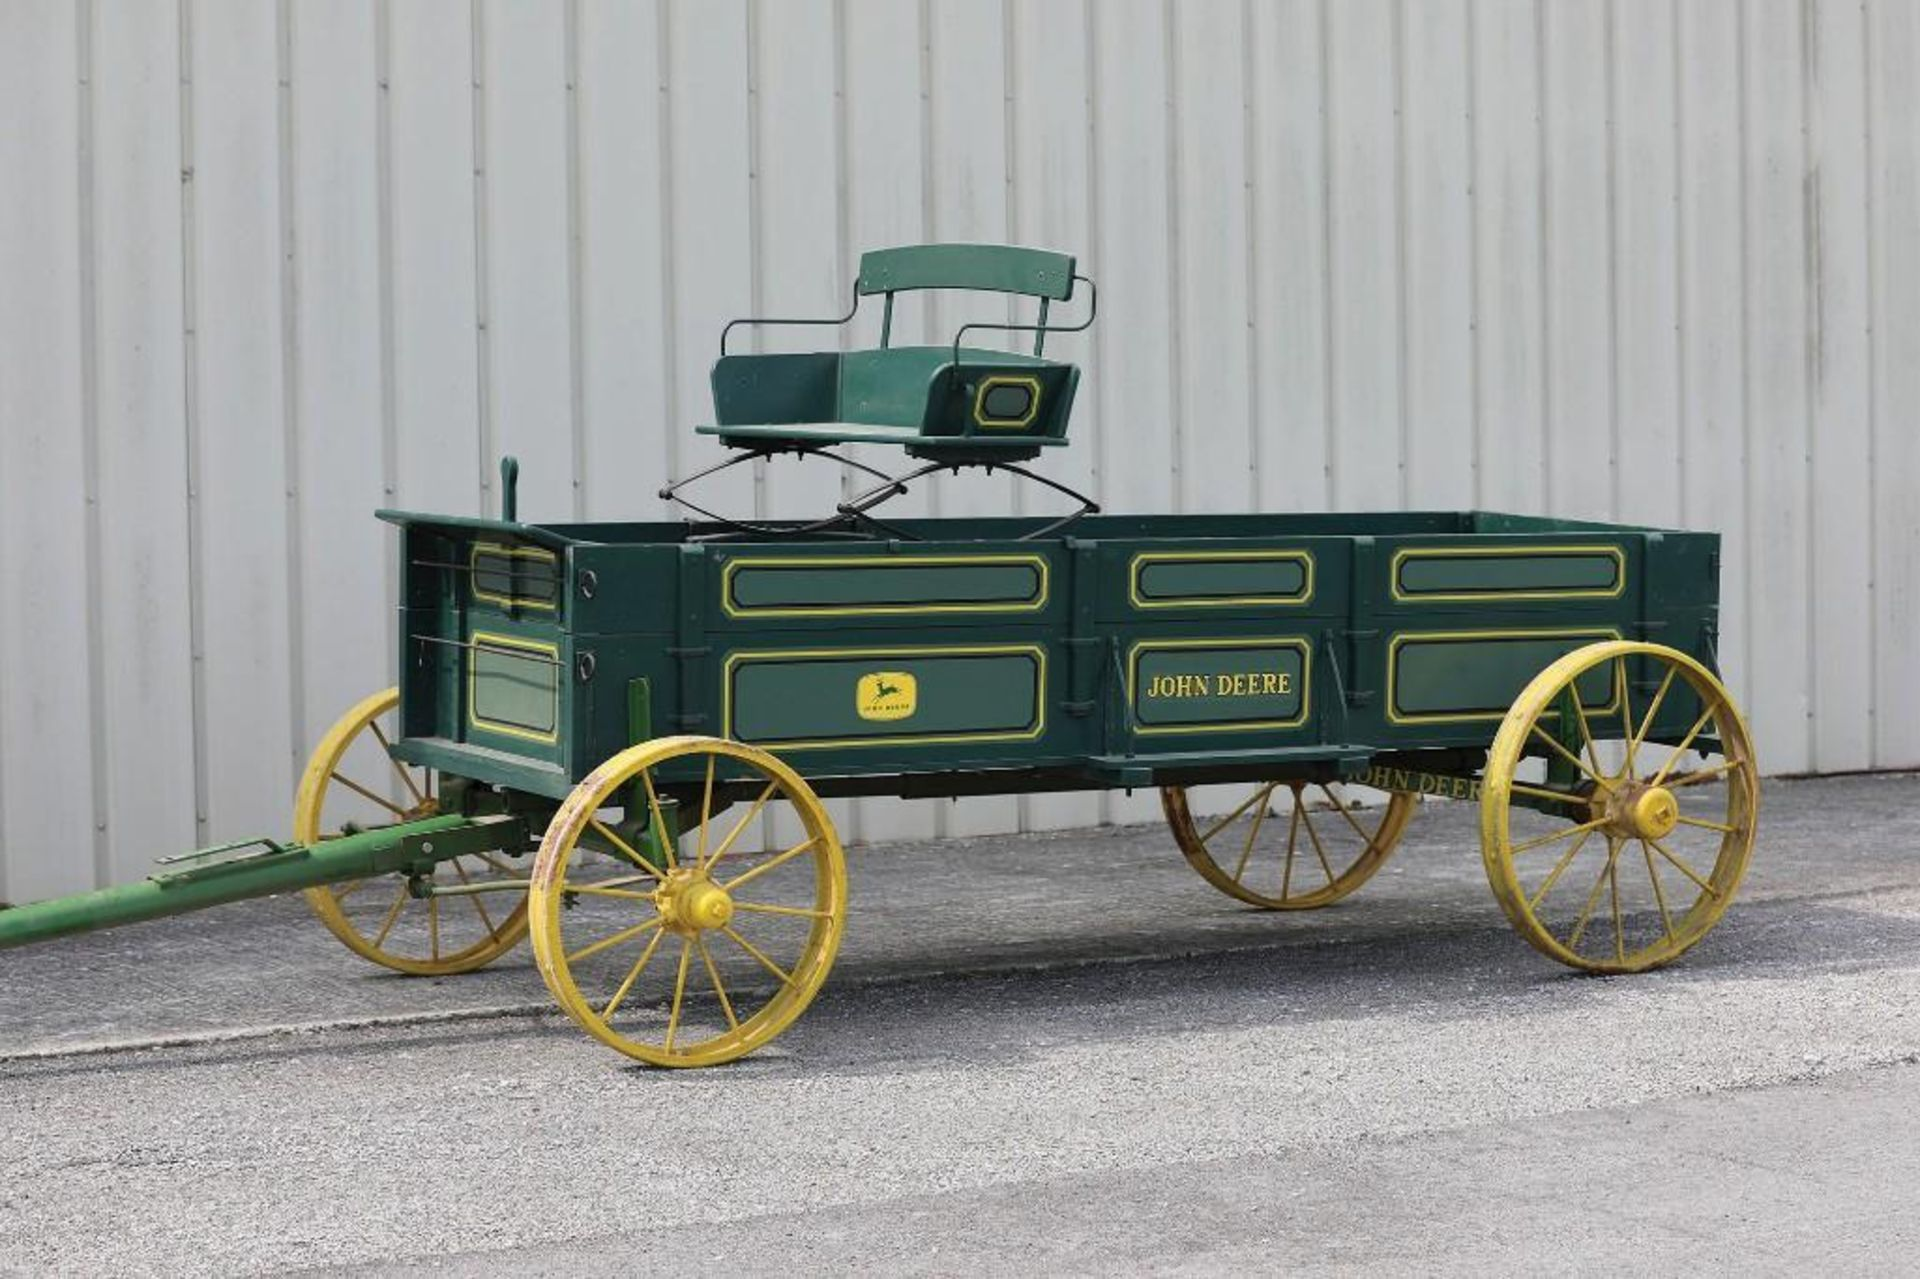 JOHN DEERE Box Bed Farm Wagon, Steel Wheels - Image 2 of 2